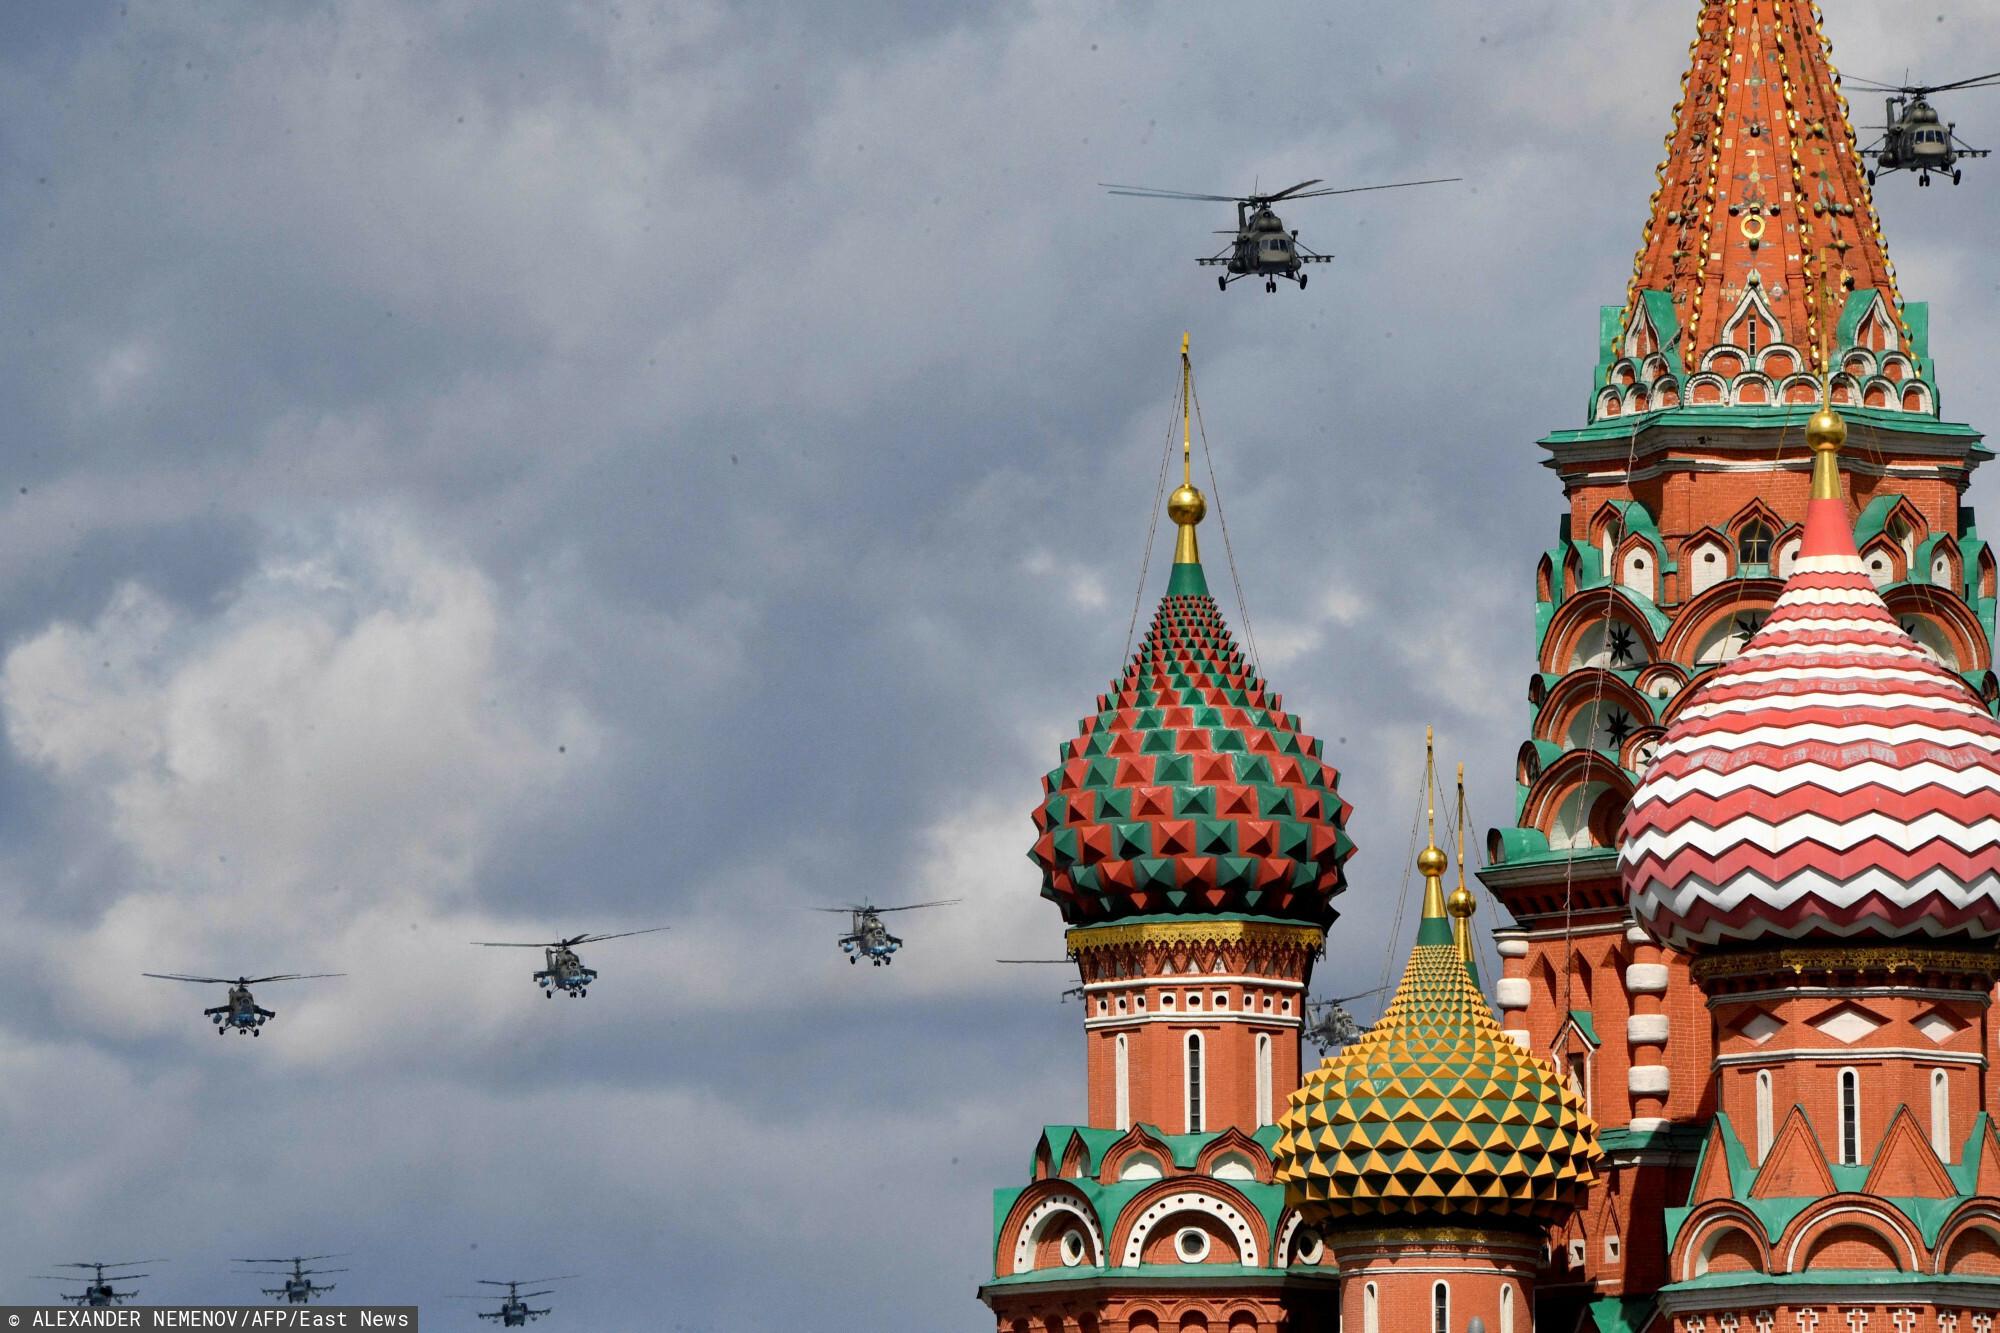 ALEXANDER NEMENOV/AFP/East News